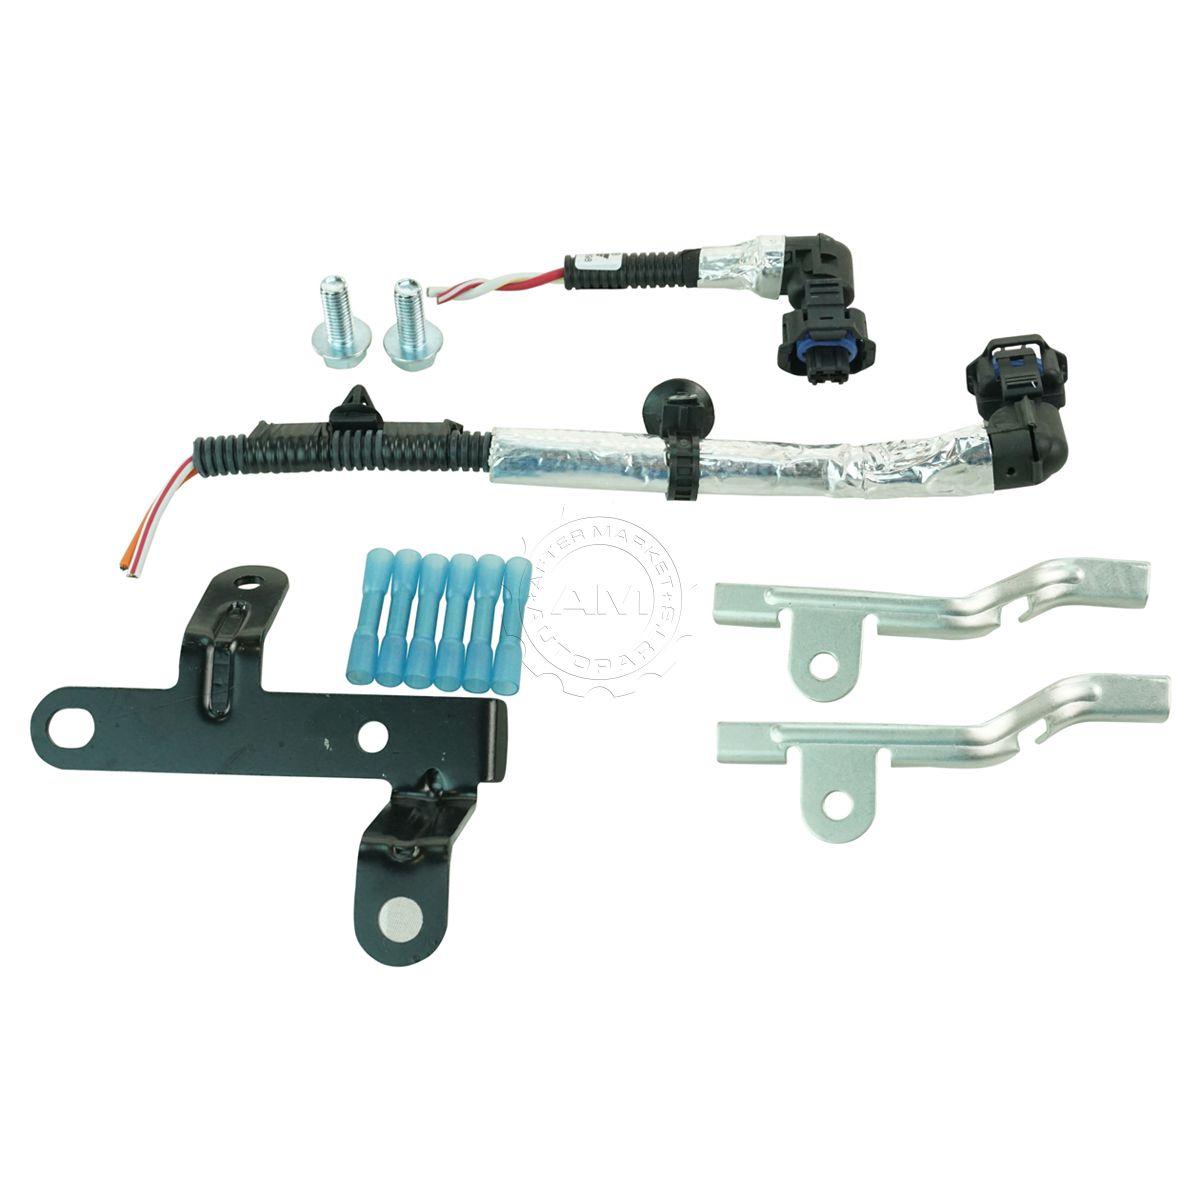 hight resolution of dorman fuel injector wiring harness repair kit updated design for duramax diesel